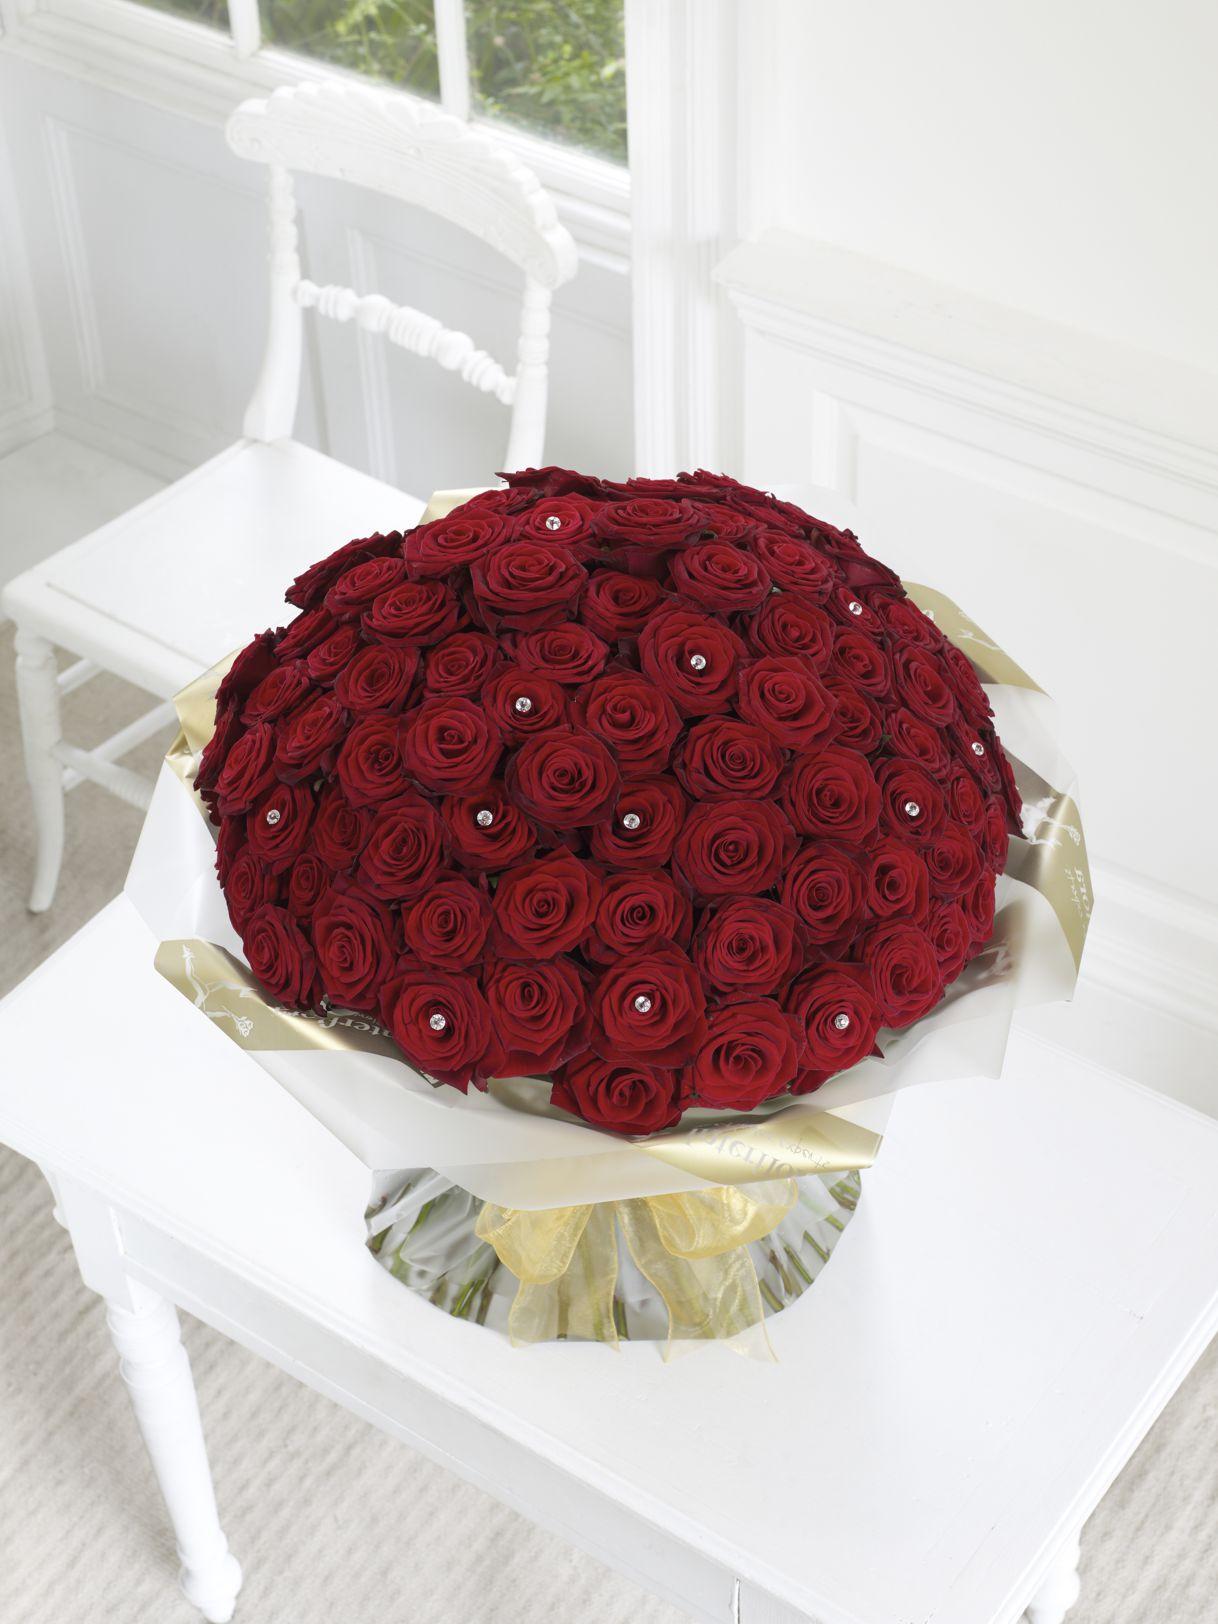 Envía Flores para tu novia en San Valentin